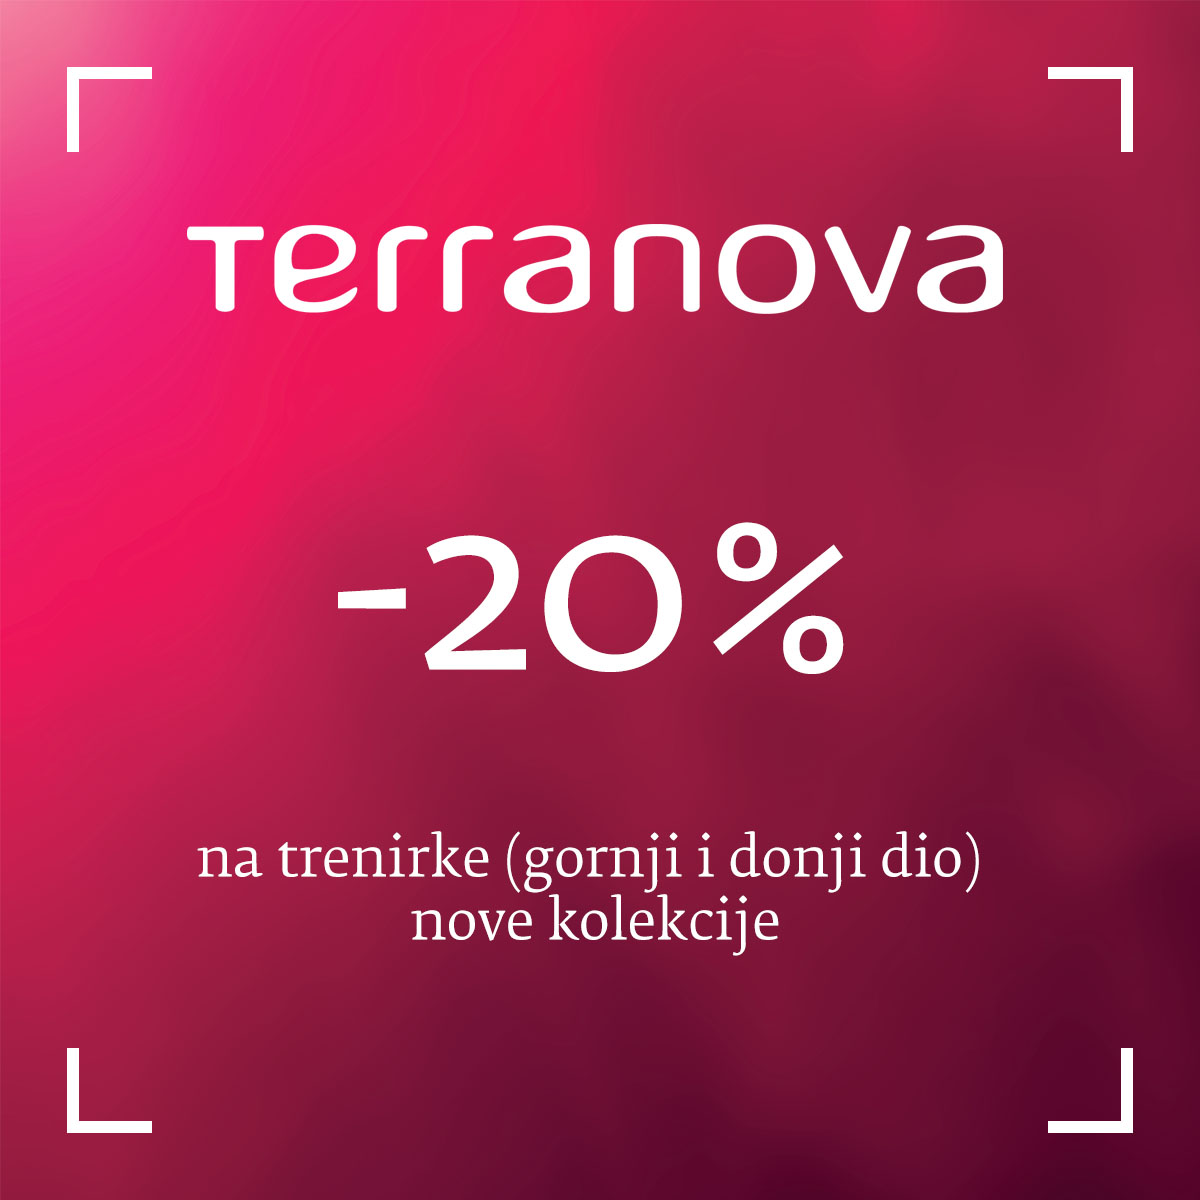 instagram terranova